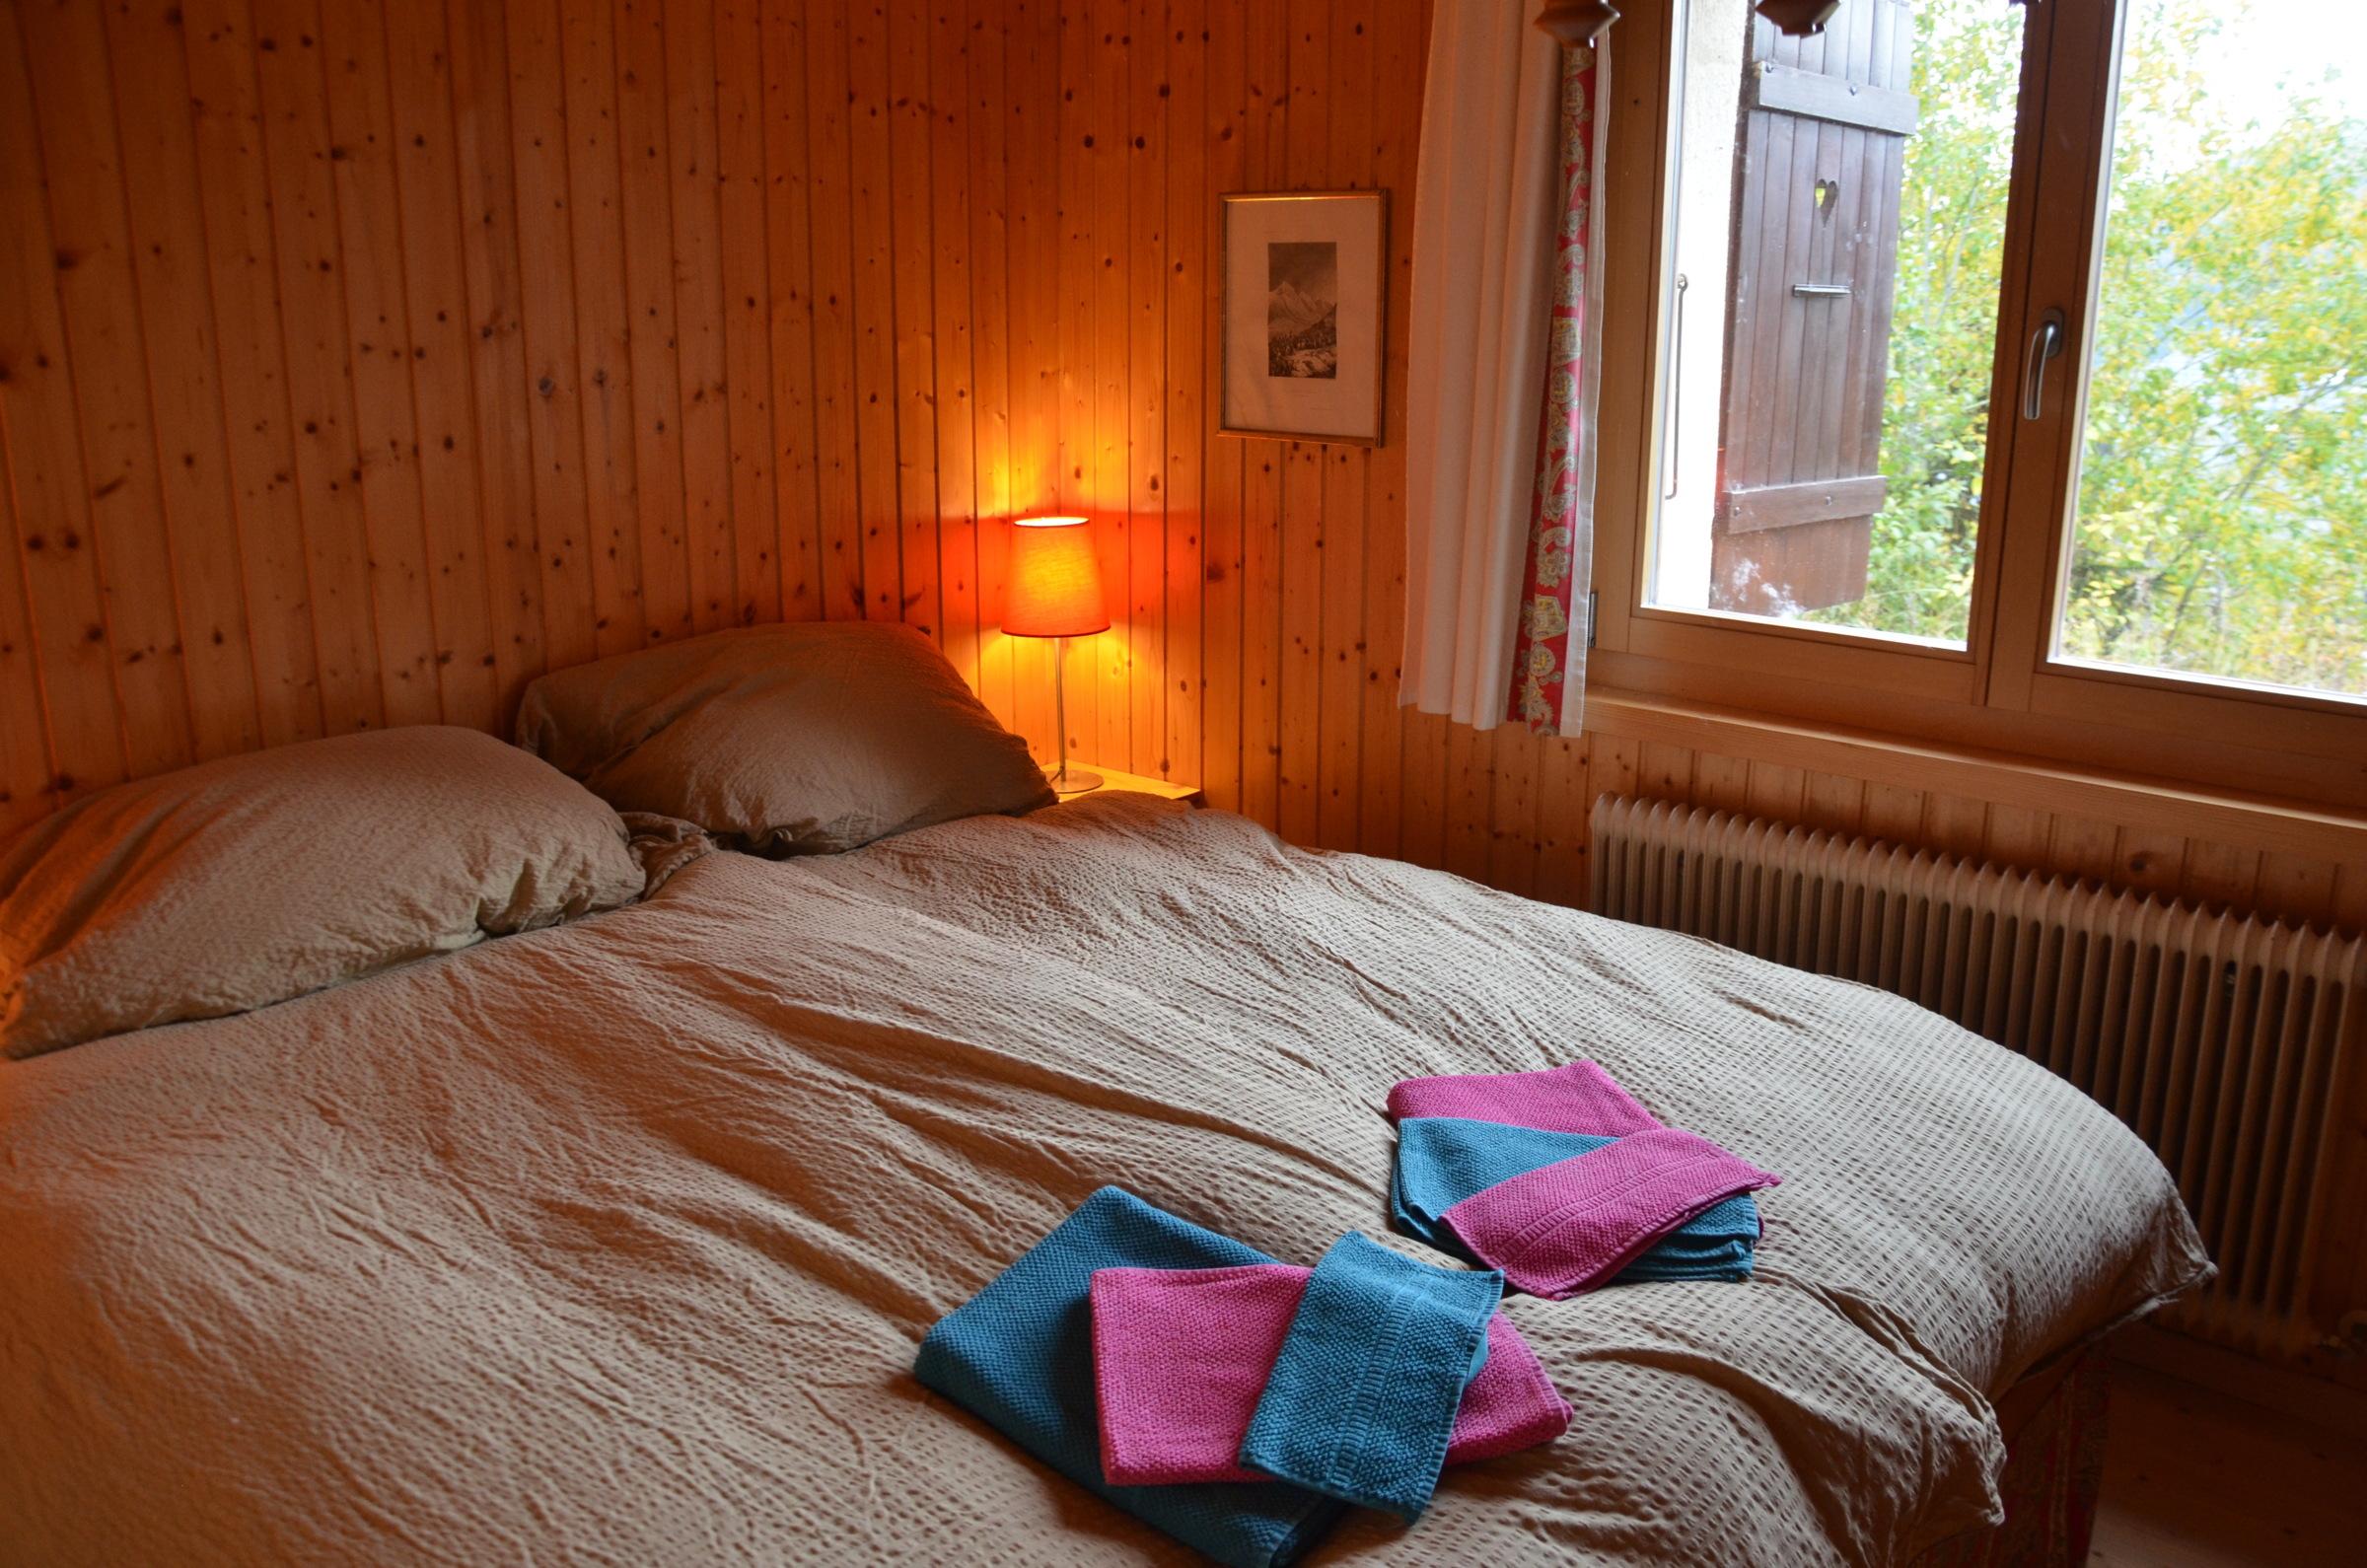 Ferienhaus Chalet André (2470666), Thyon-Les Collons, 4 Vallées, Wallis, Schweiz, Bild 16